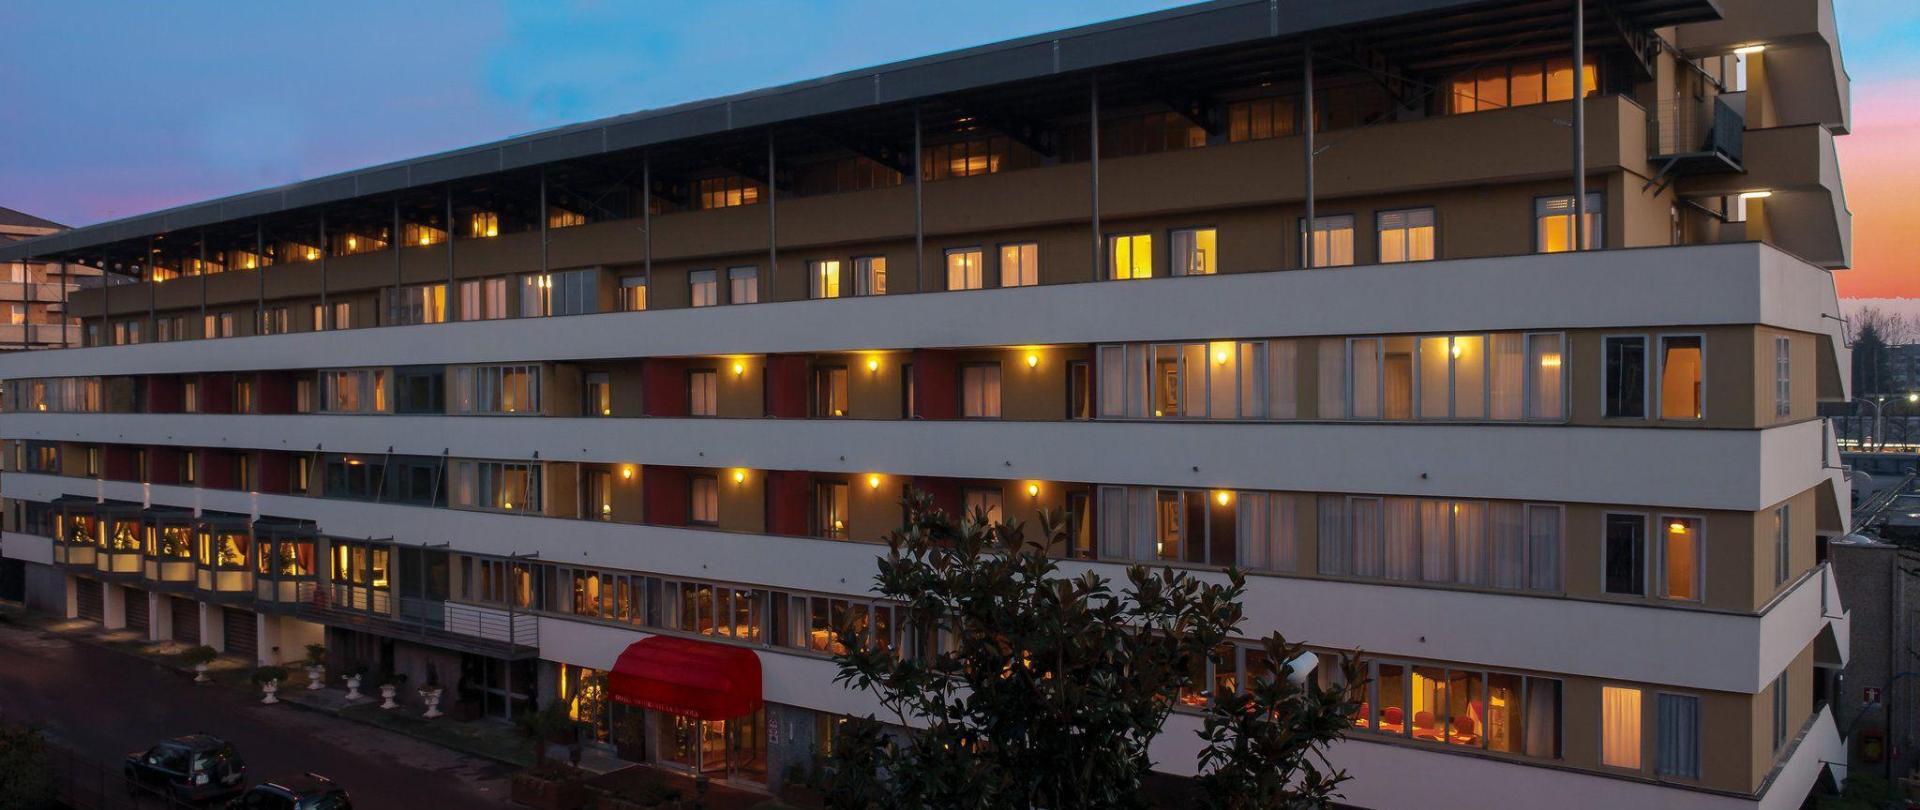 hotel-la-bussola-novara.jpg